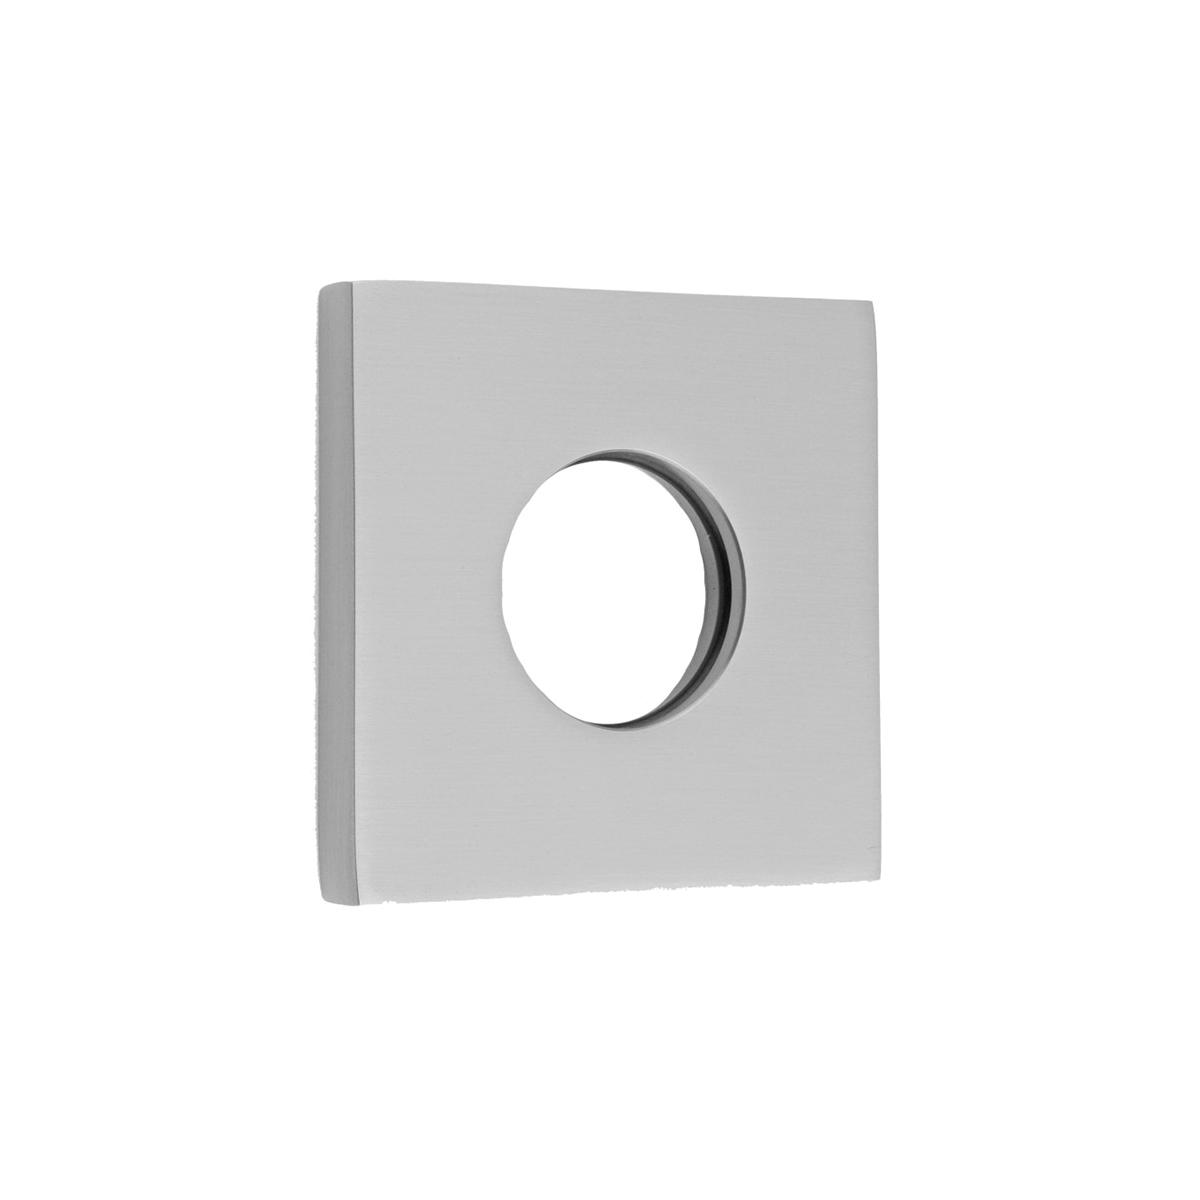 Jaclo® 6007-SN Sliding Square Escutcheon, Solid Brass, Satin Nickel